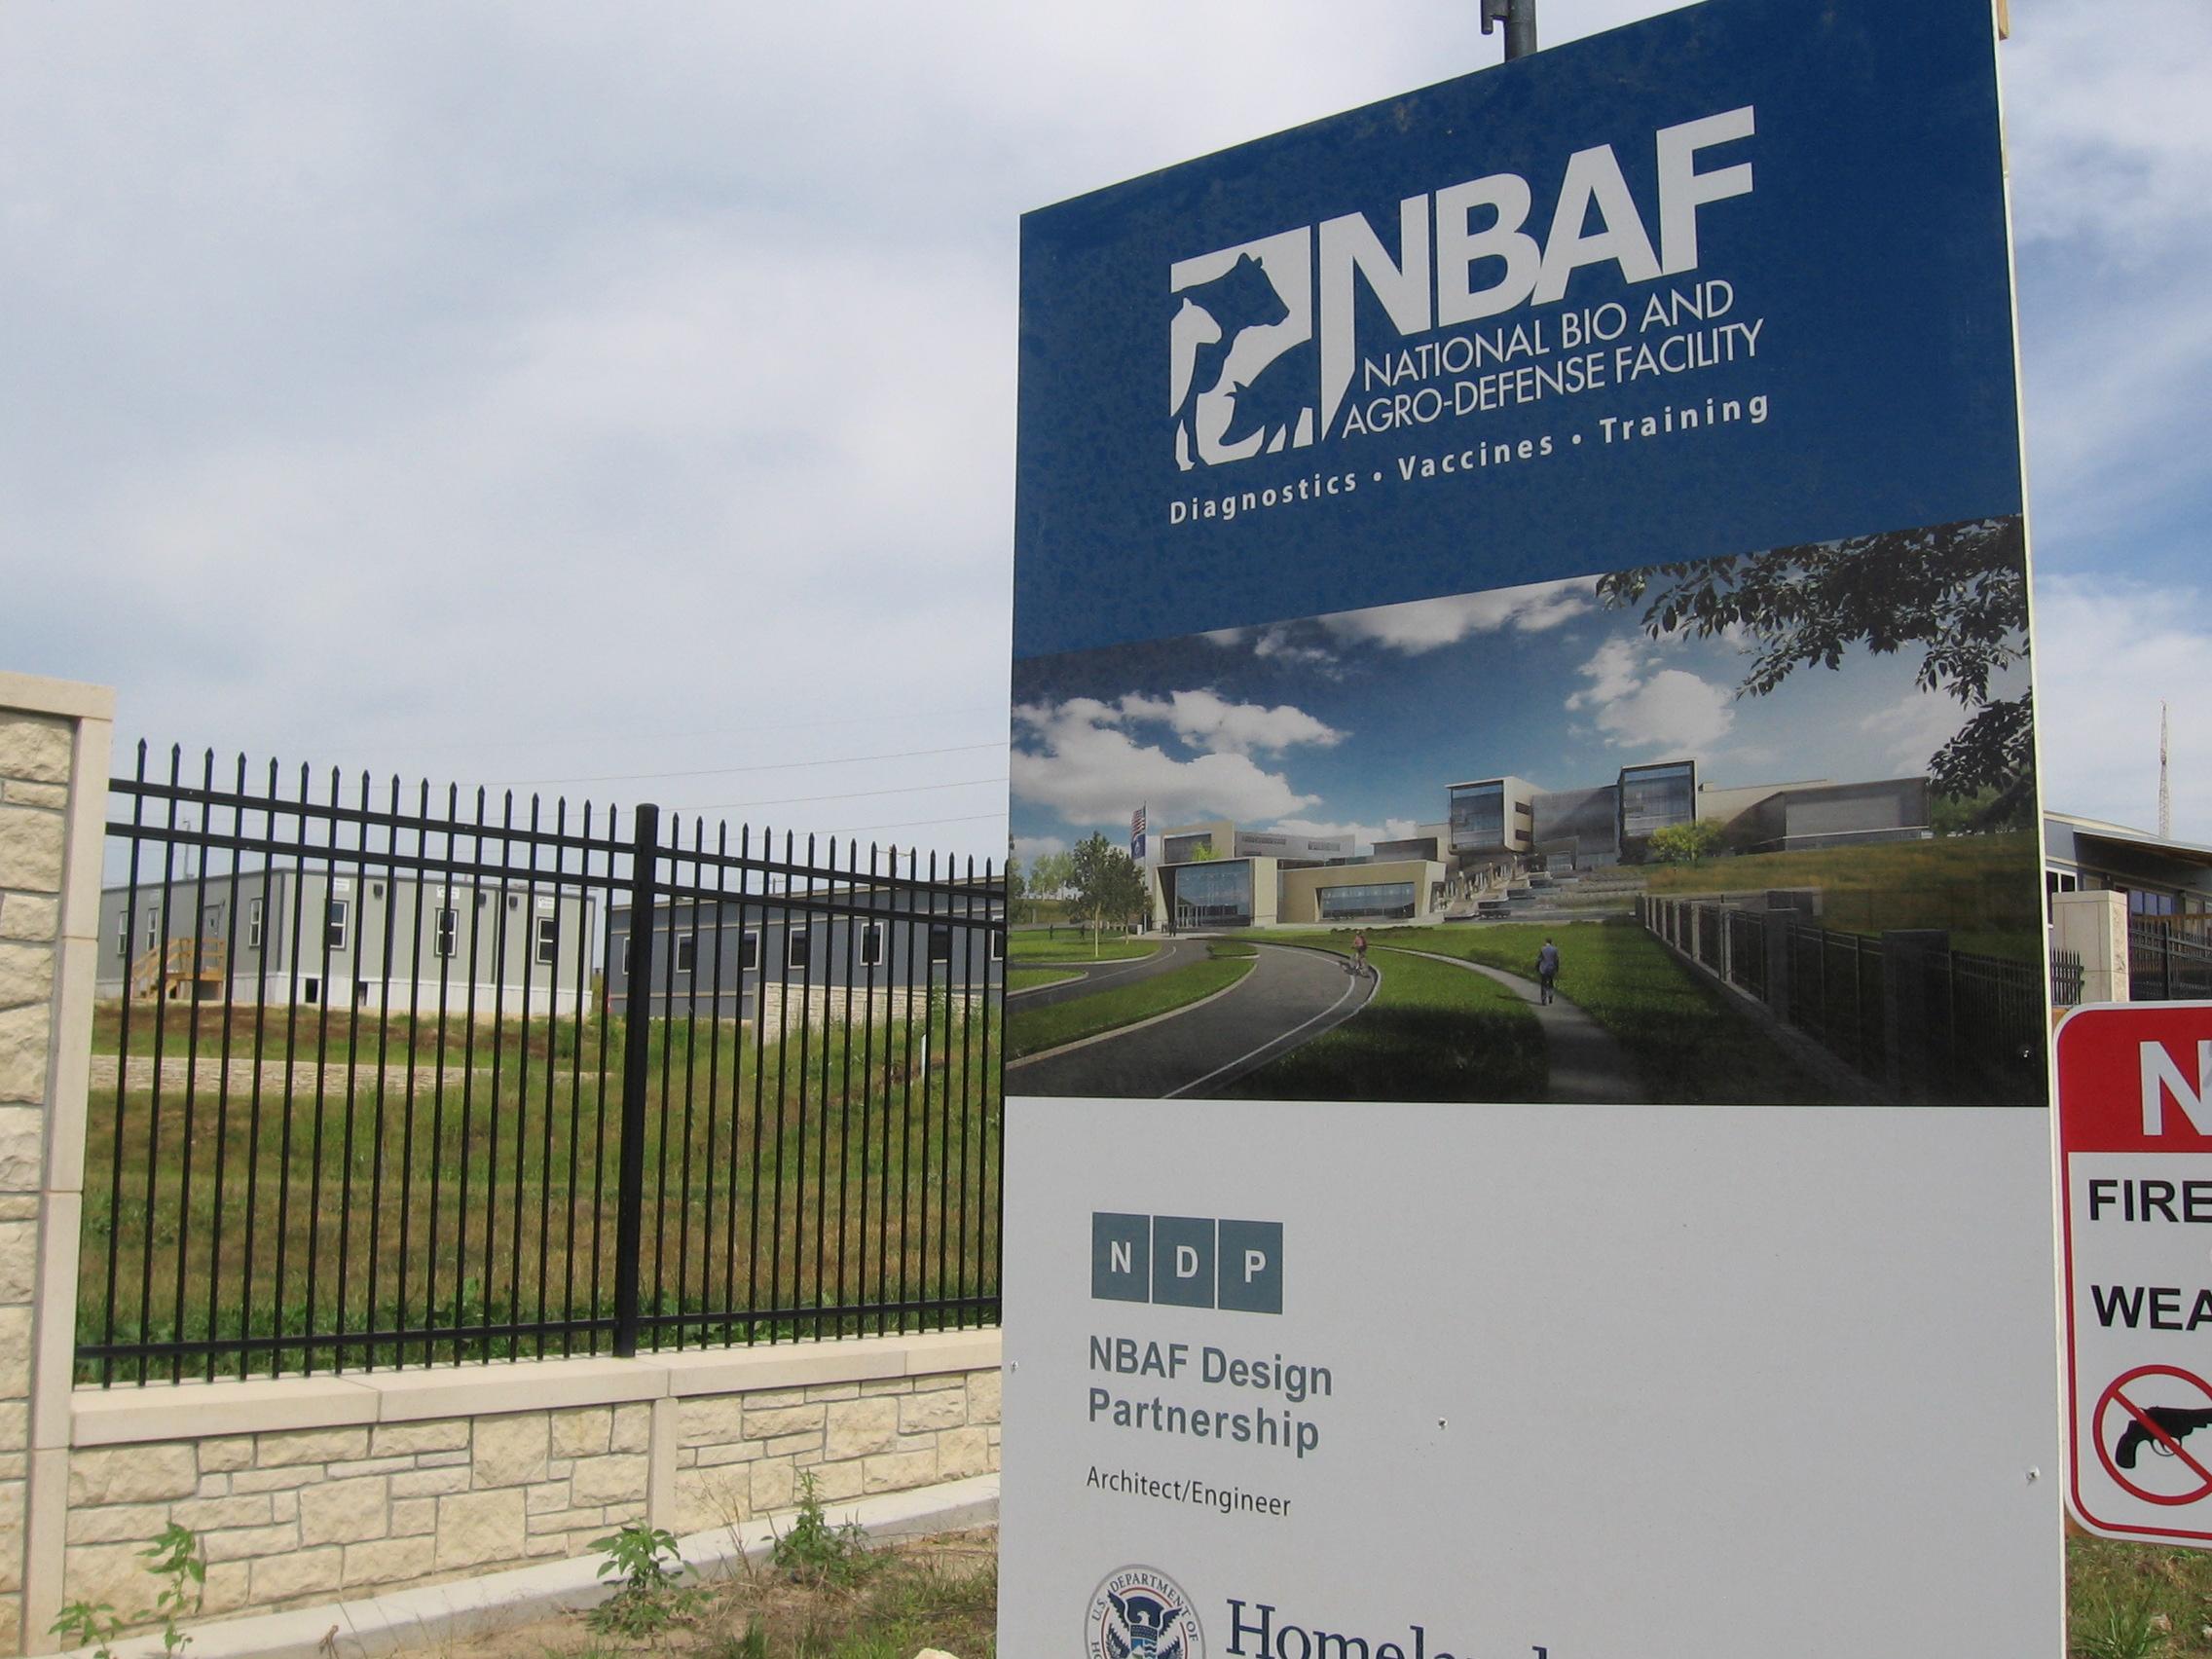 Kansas State University named future home of NBAF